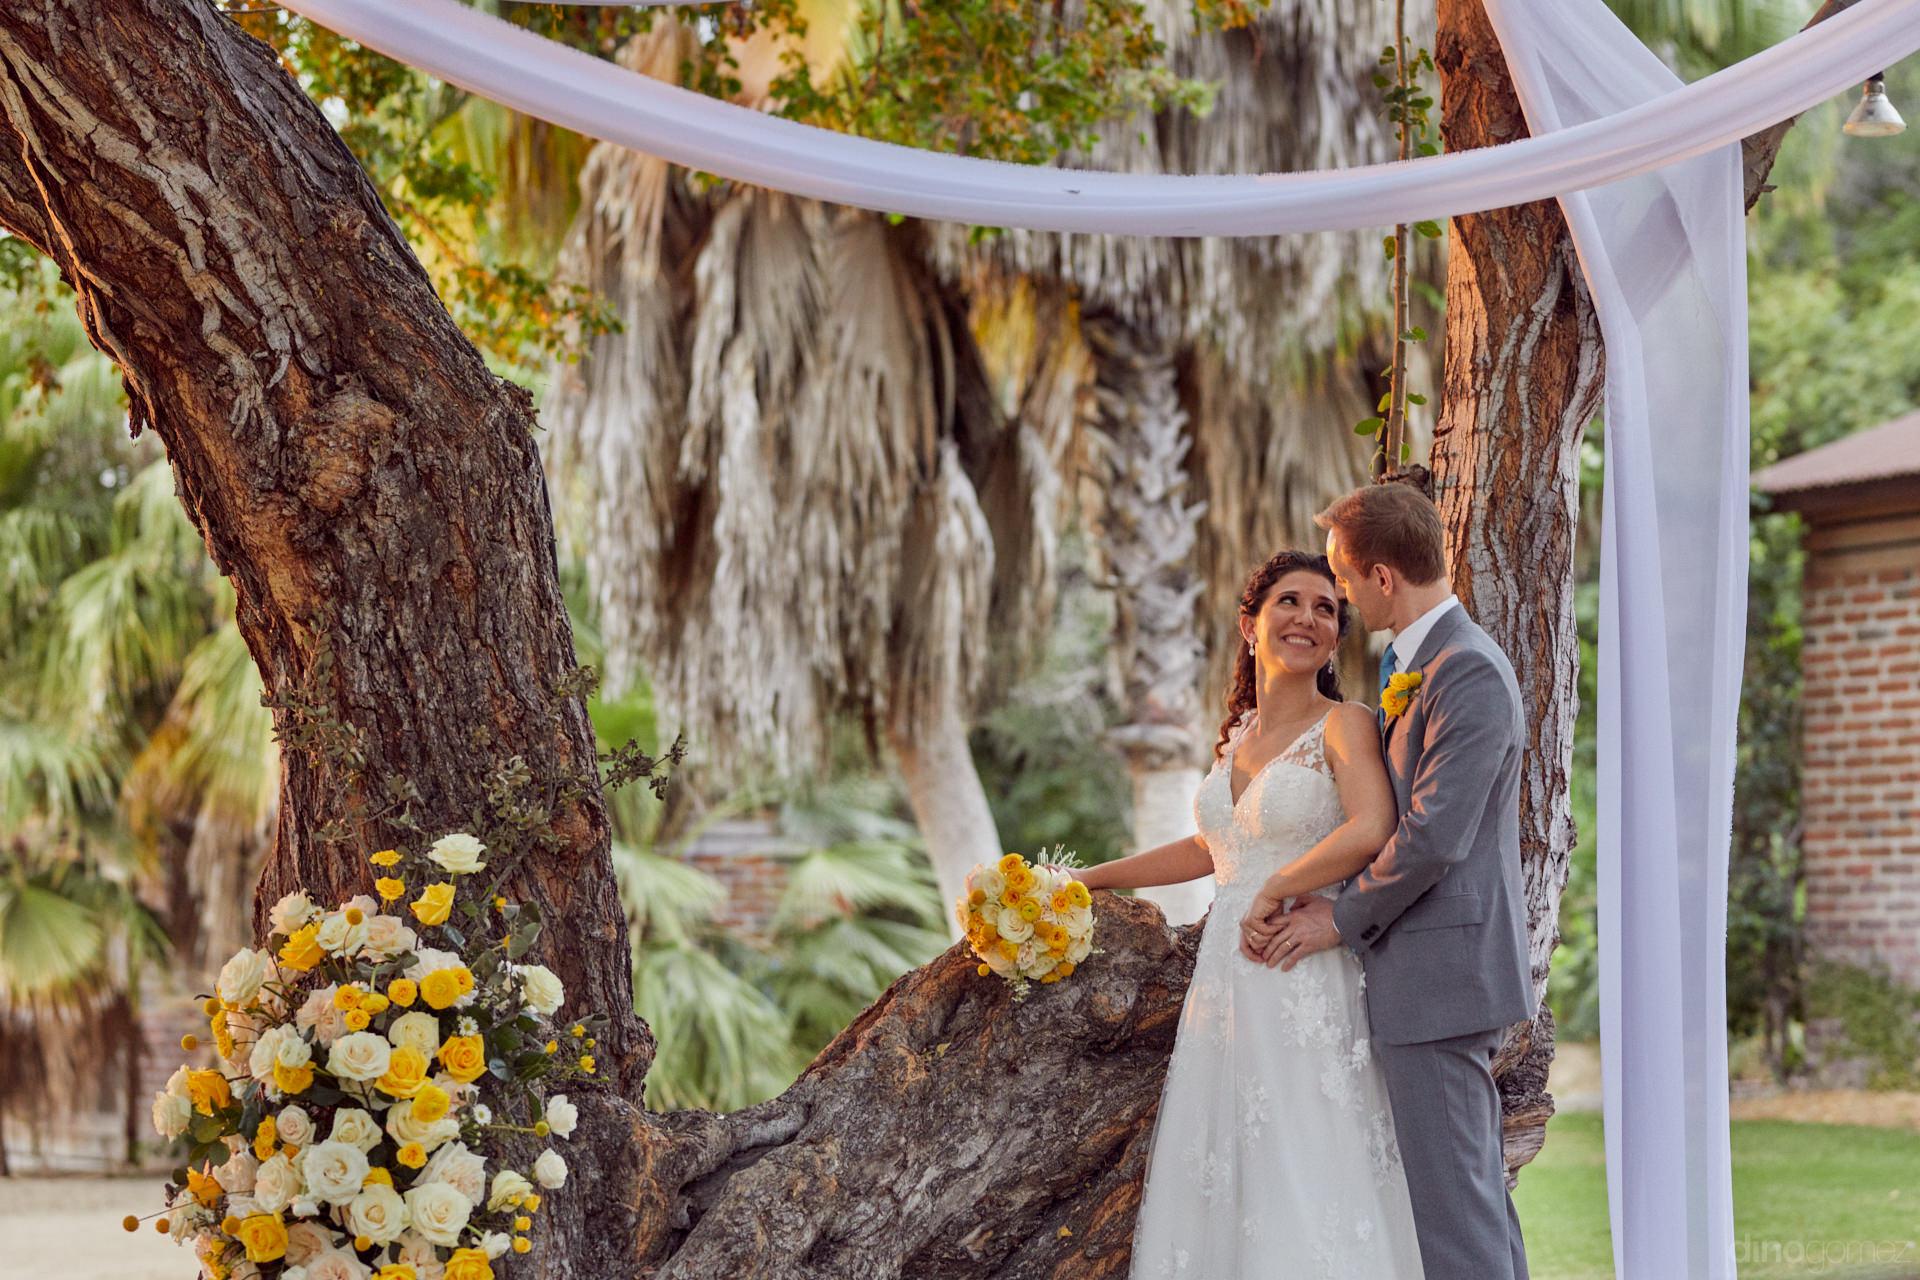 Top Cabo Wedding Photographers Like Dino Gomez - Hilary & Bryan Flora Wedding